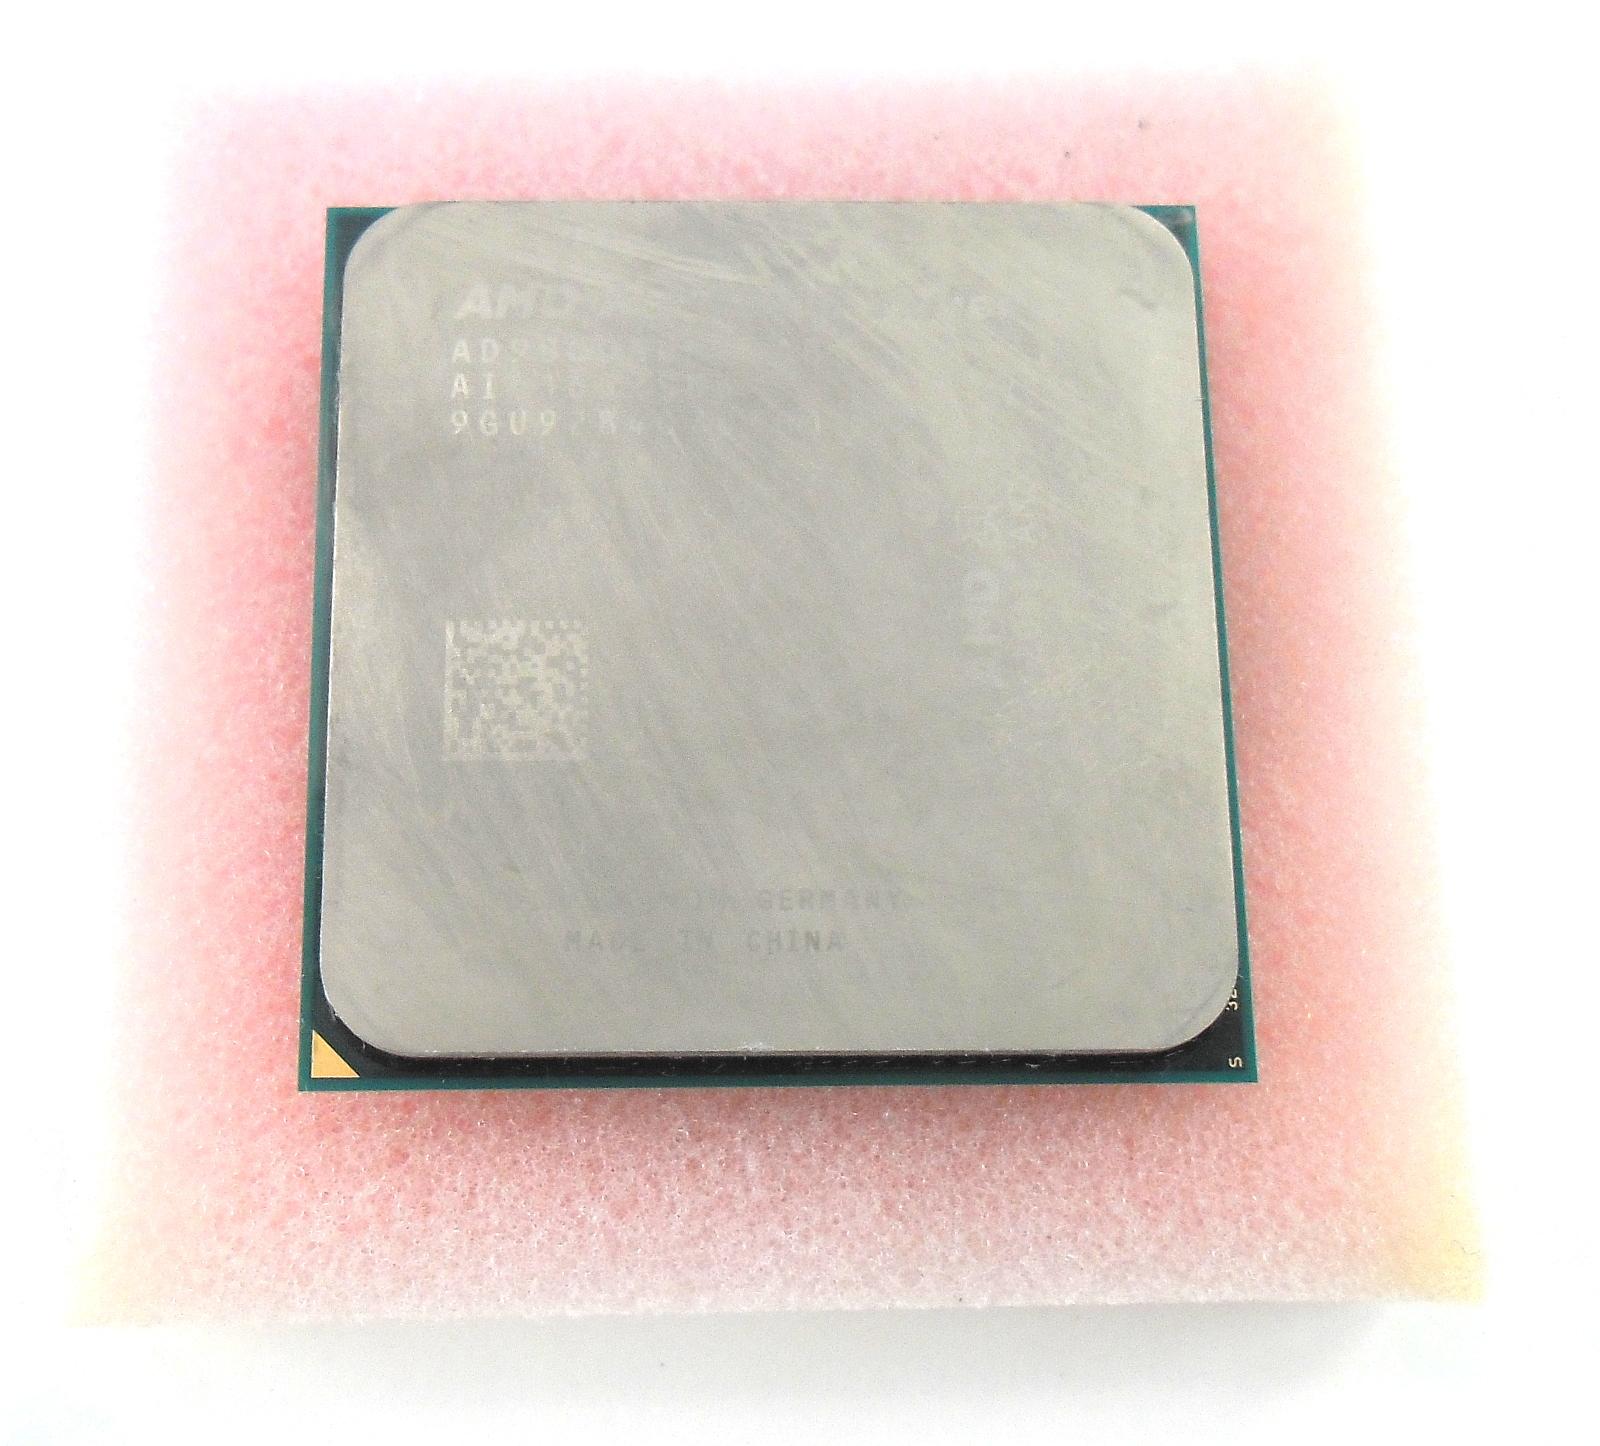 AMD A12 9800E CPU Radeon R7 GPU AD9800AHM44AB Socket AM4